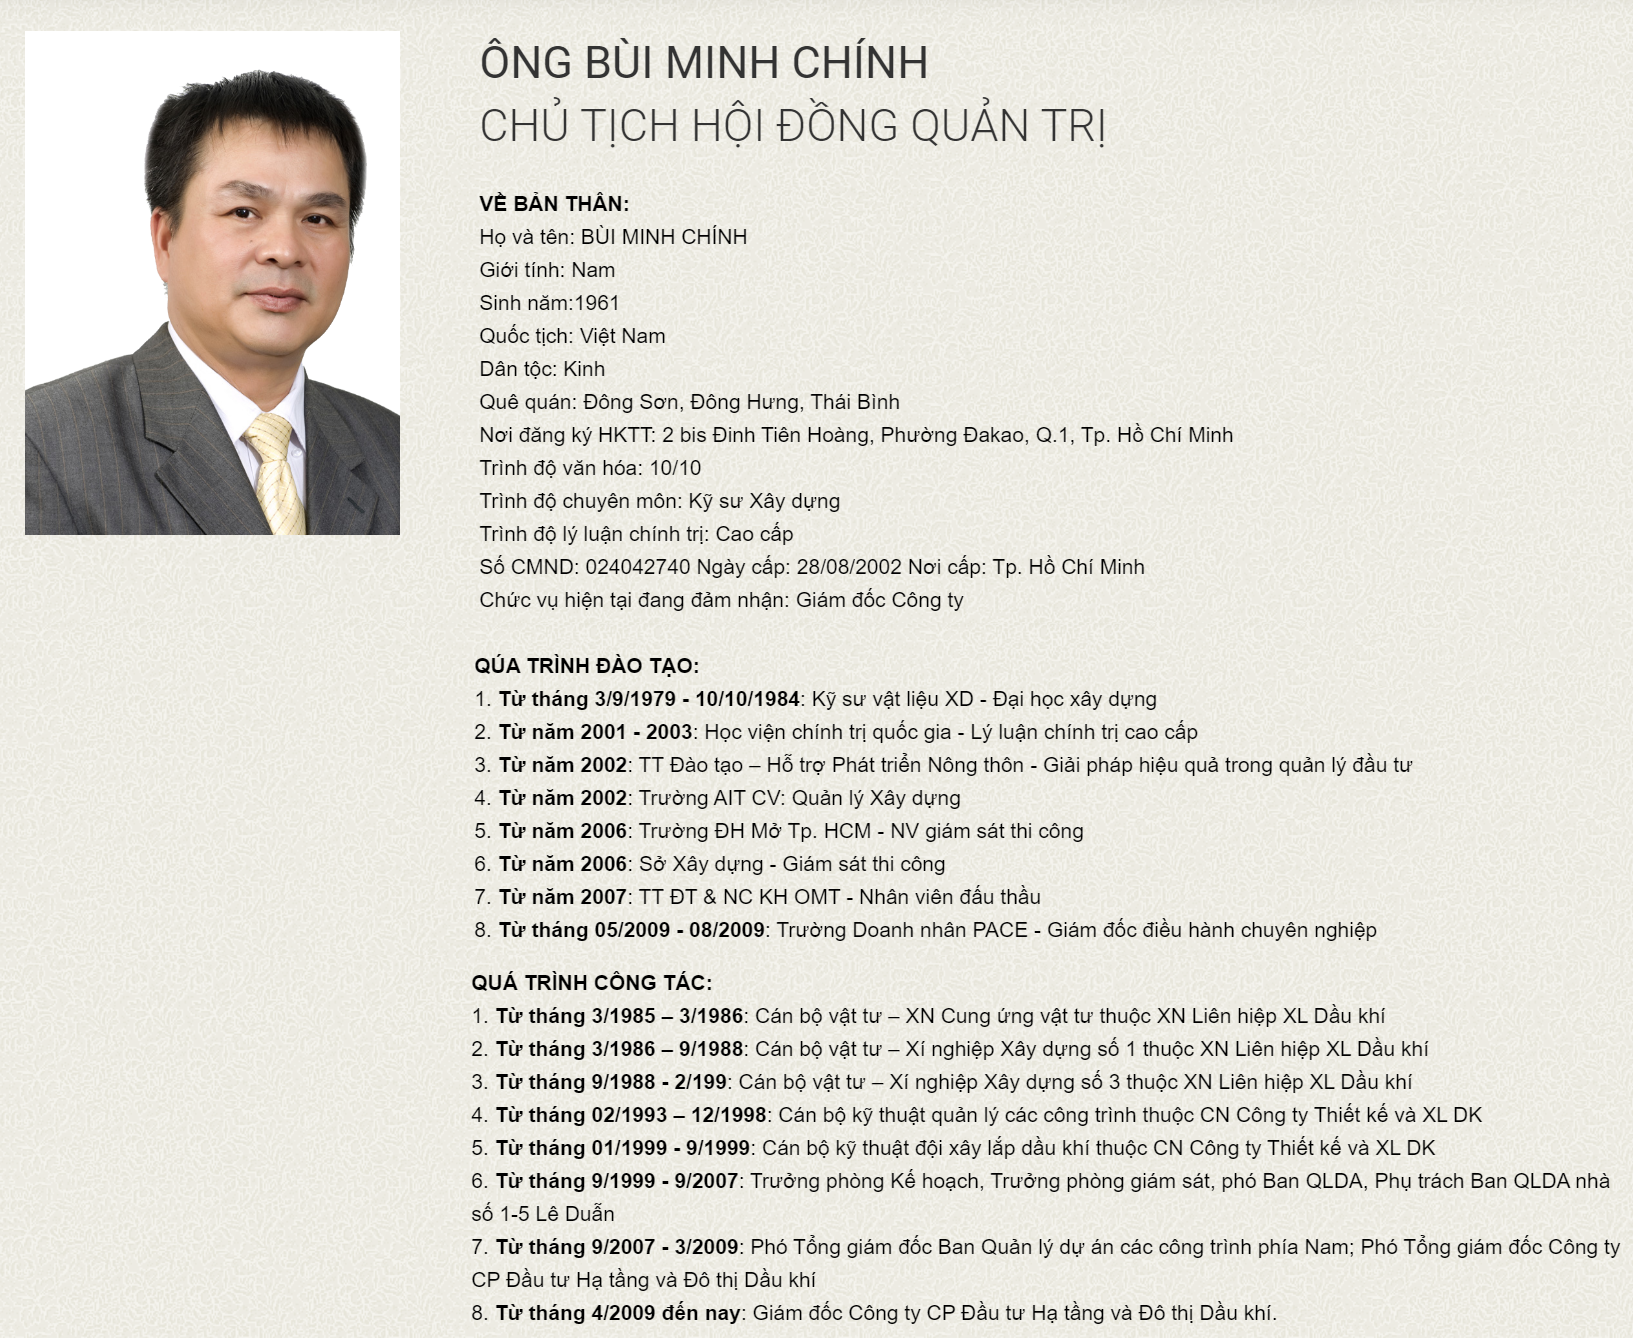 Bui-Minh-Chinh